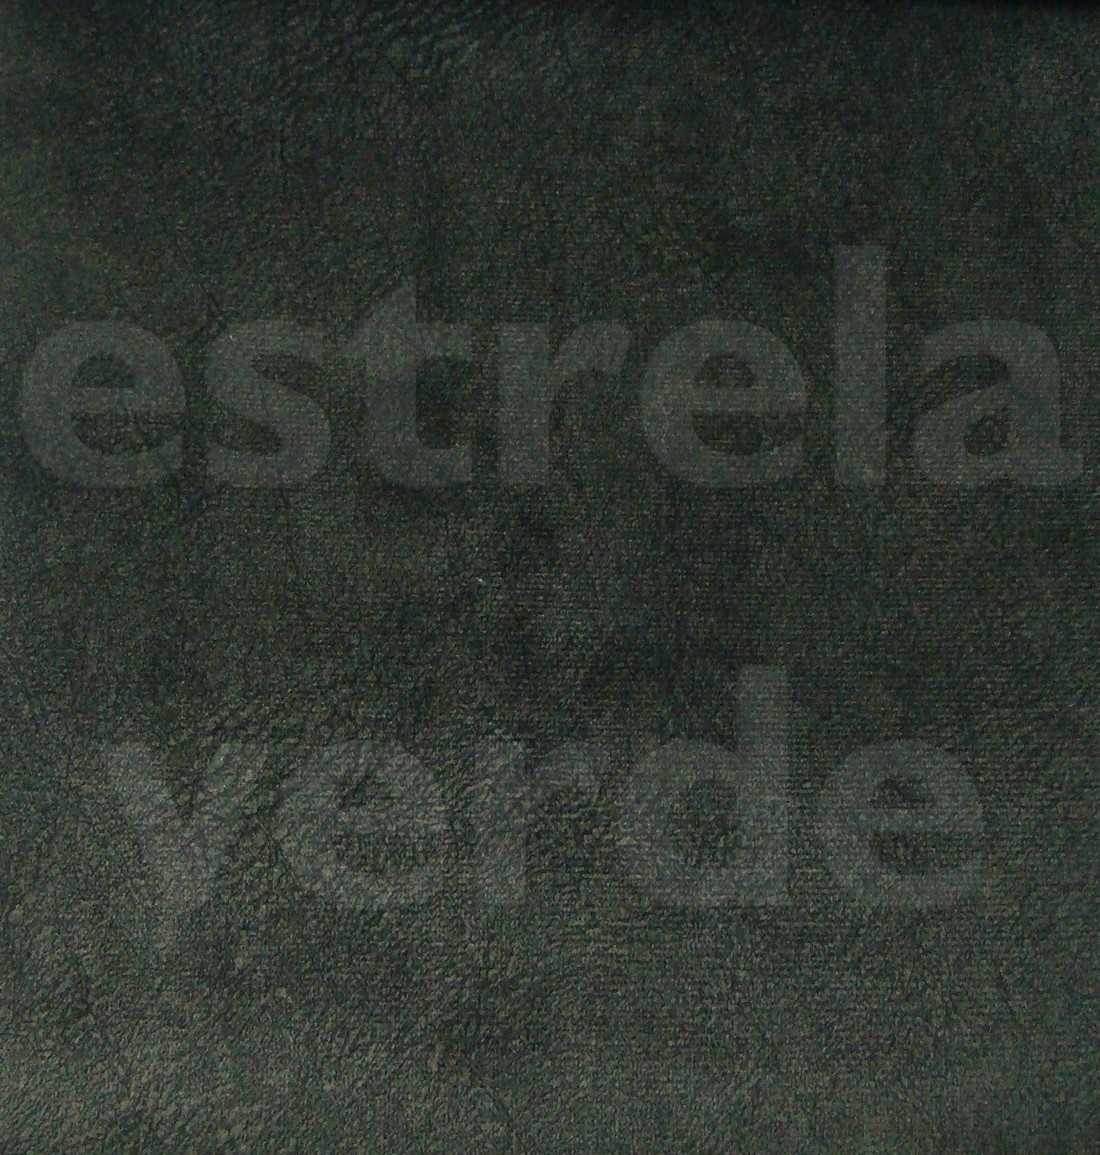 SUEDE DAMASCO MARROM/SUPER BROWN (108-87) (DESCONT  - Estrela Verde